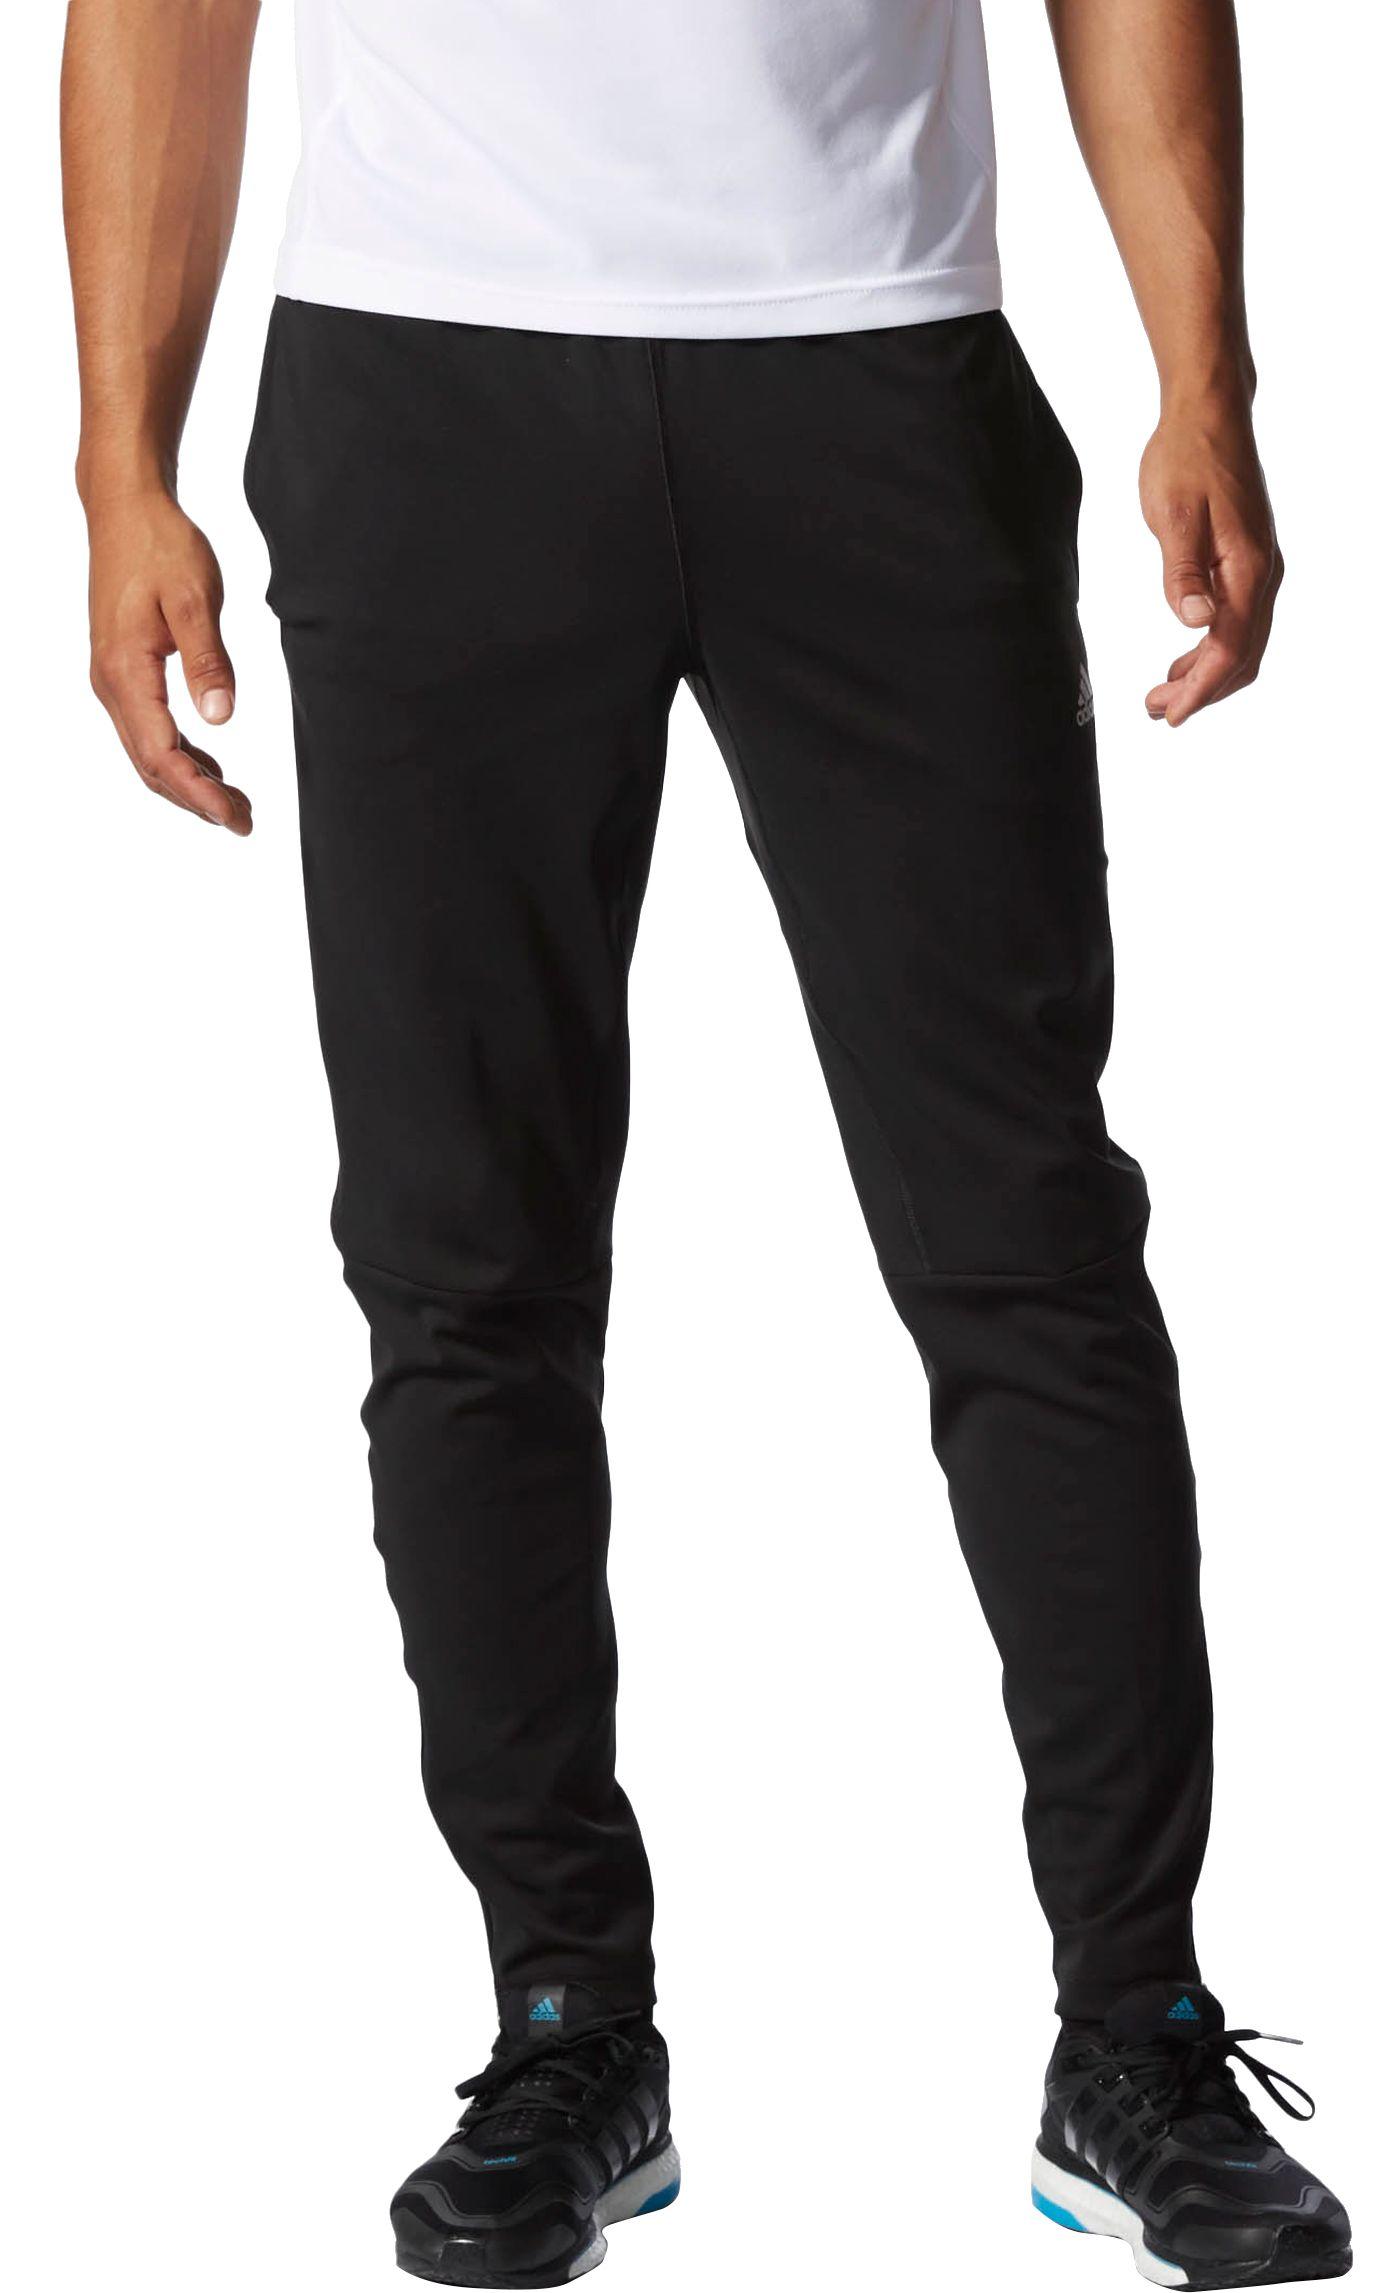 adidas Men's 16 Response Astro Running Pants